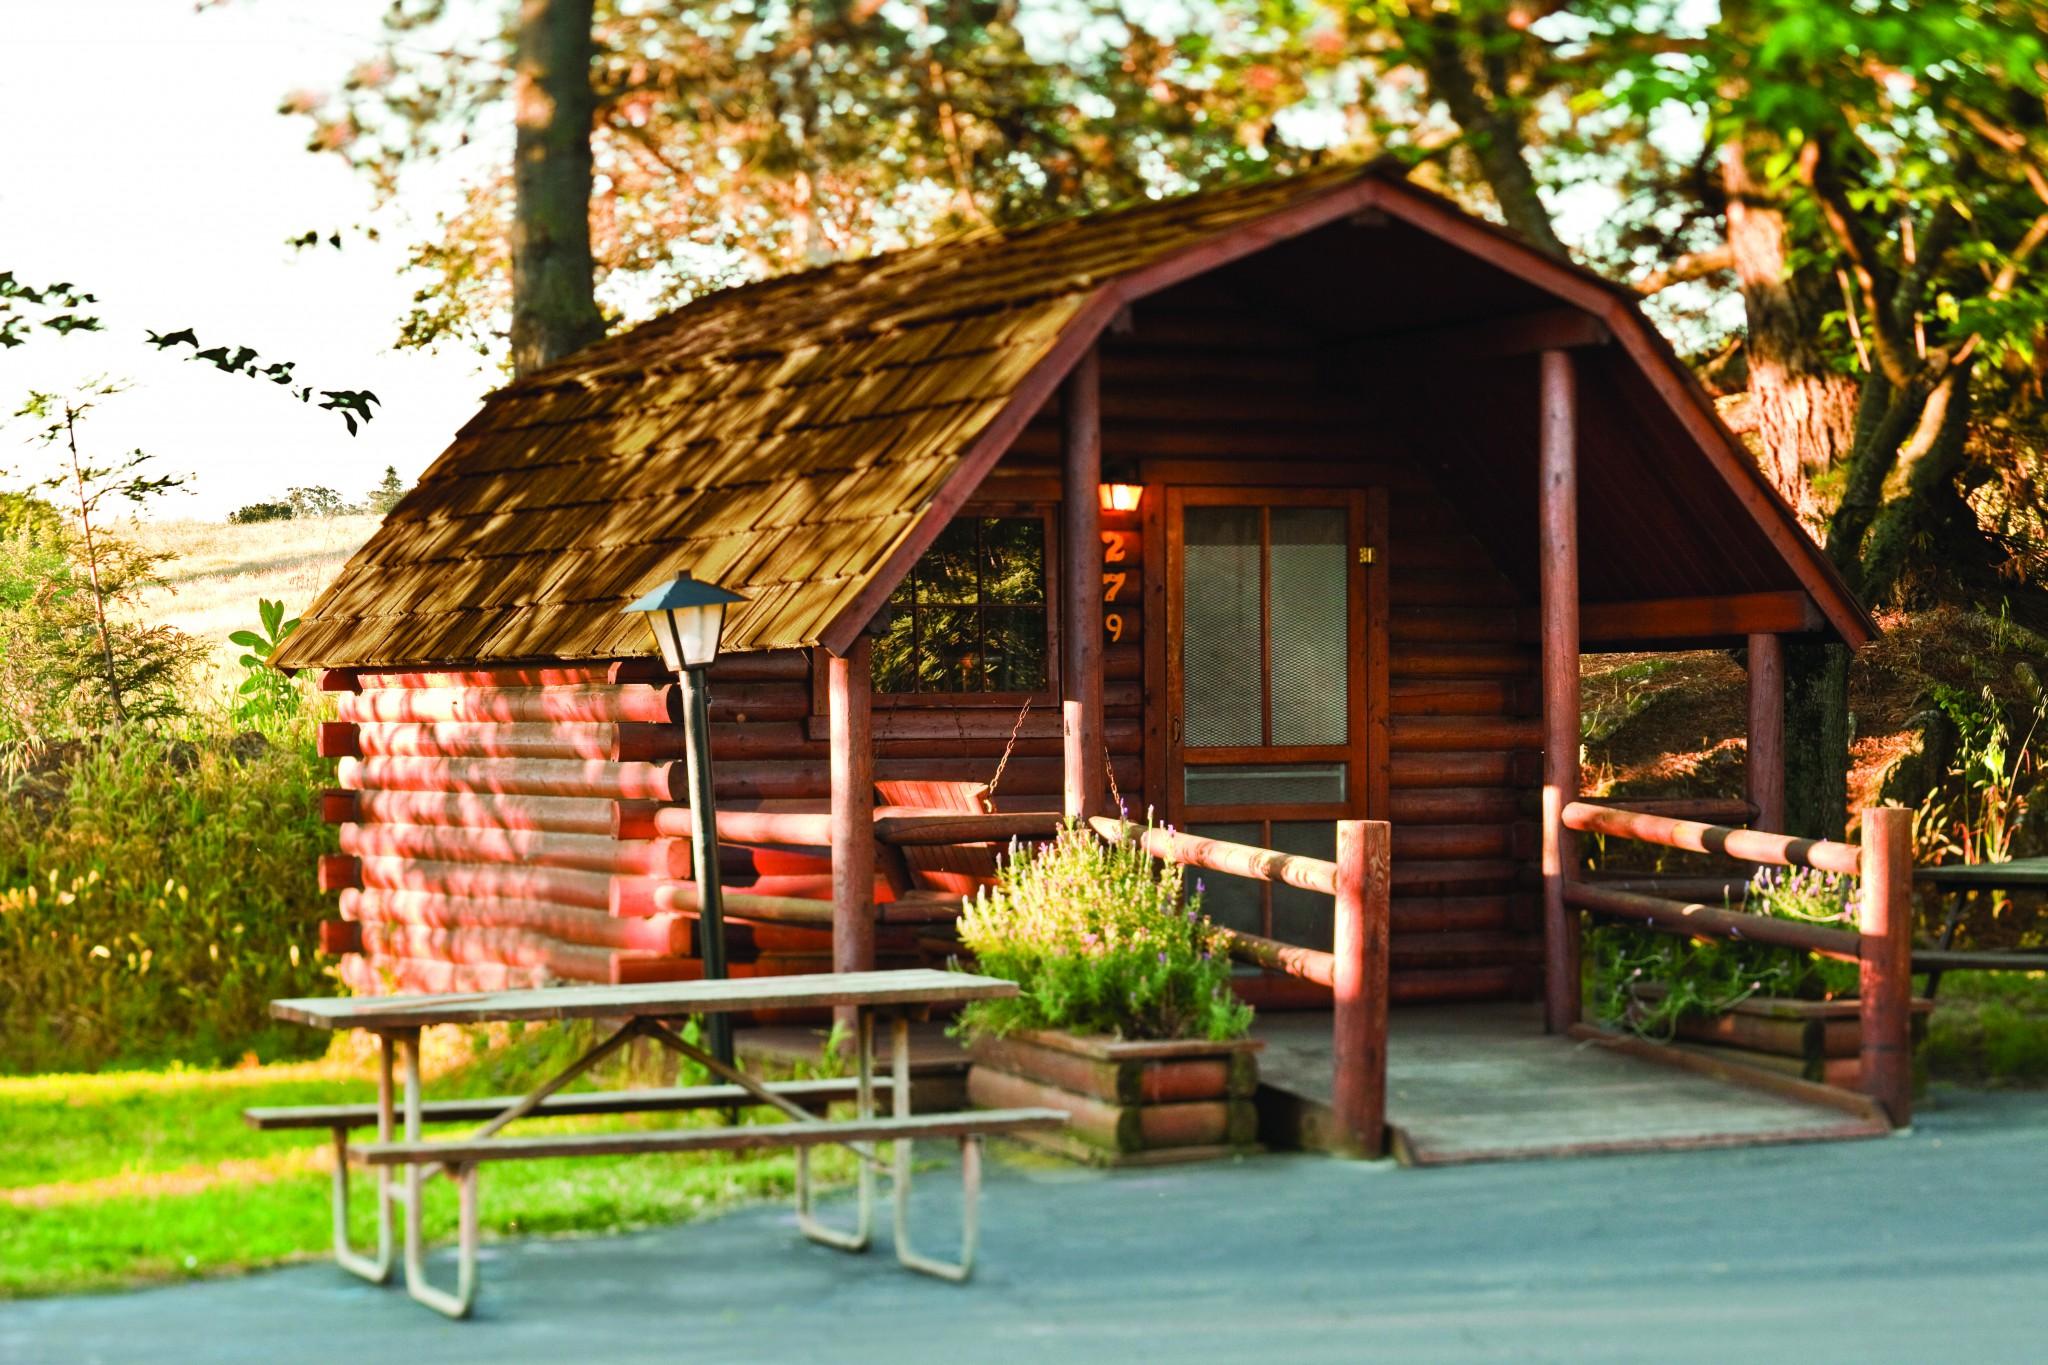 Hagerstown Antietam Battlefield Koa Camping Cabins